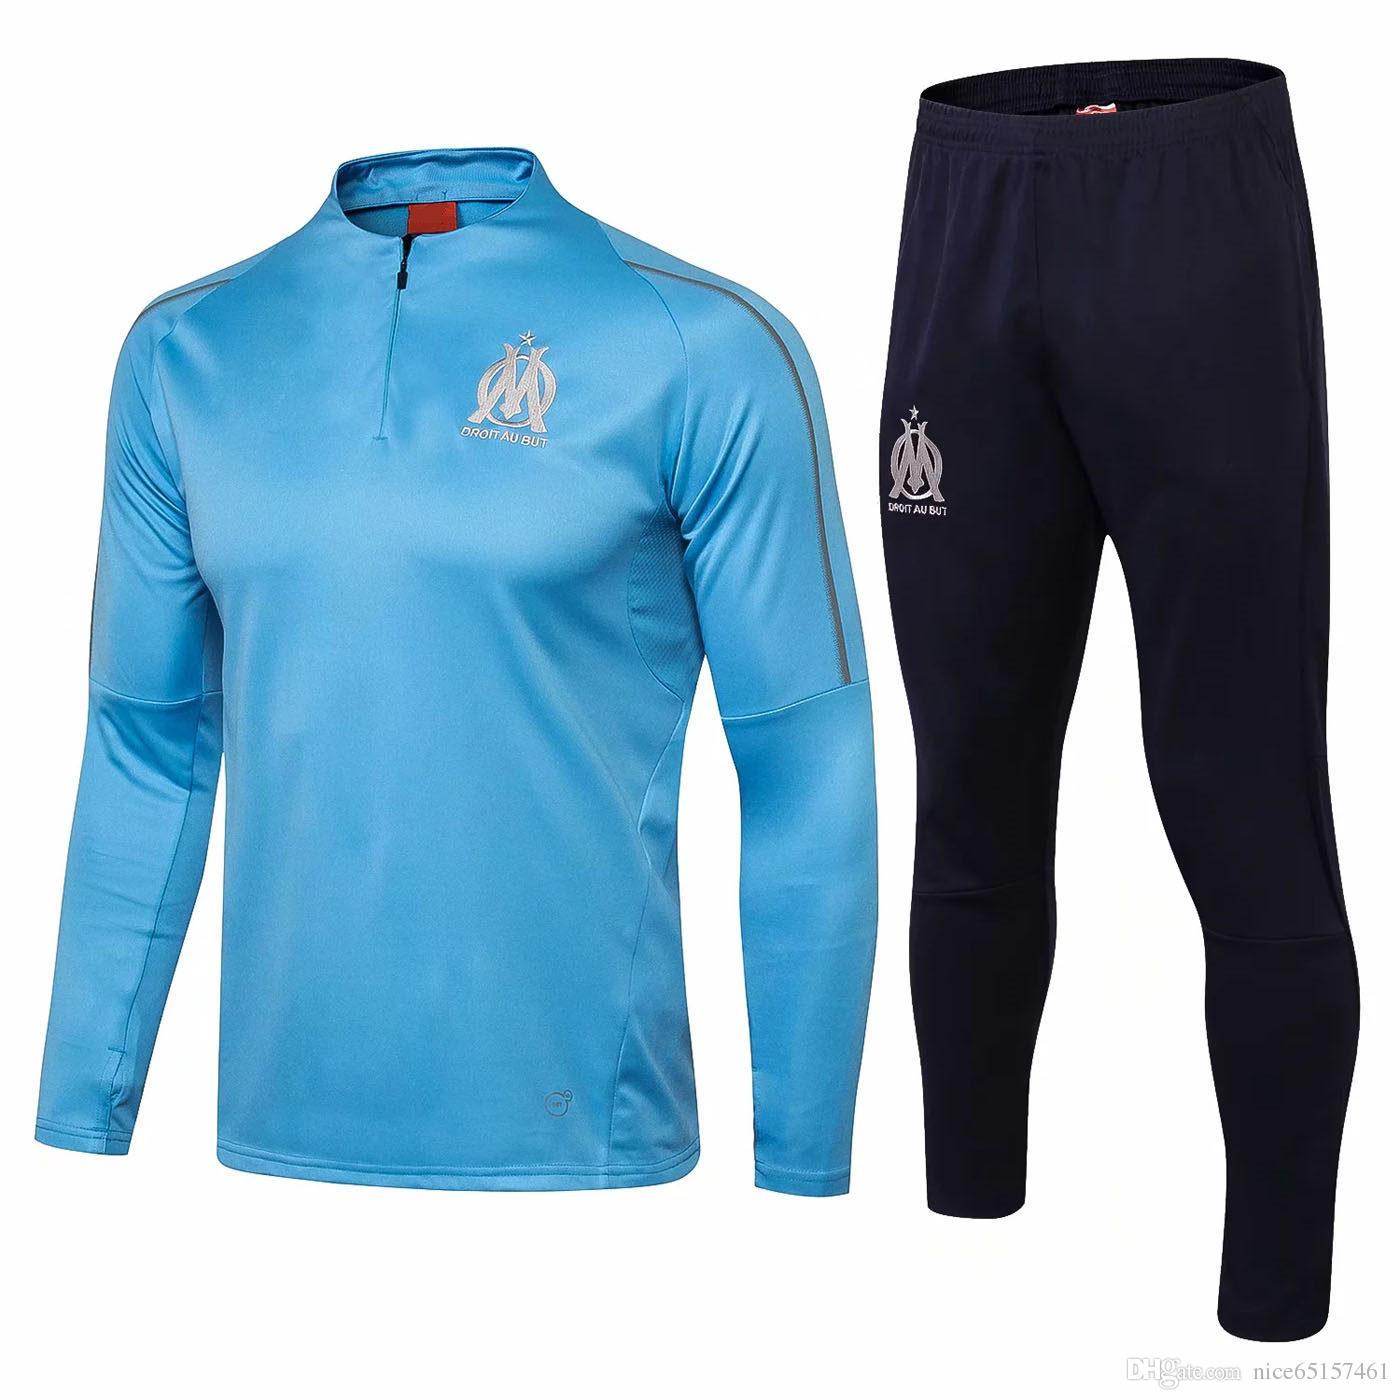 recognized brands buy sale pre order 2018 2019 OM Olympique de Marseille survetement Jacket Kits Mbappe PAYET  THAUVIN training suit Soccer 18/19 Tracksuit Sets Football